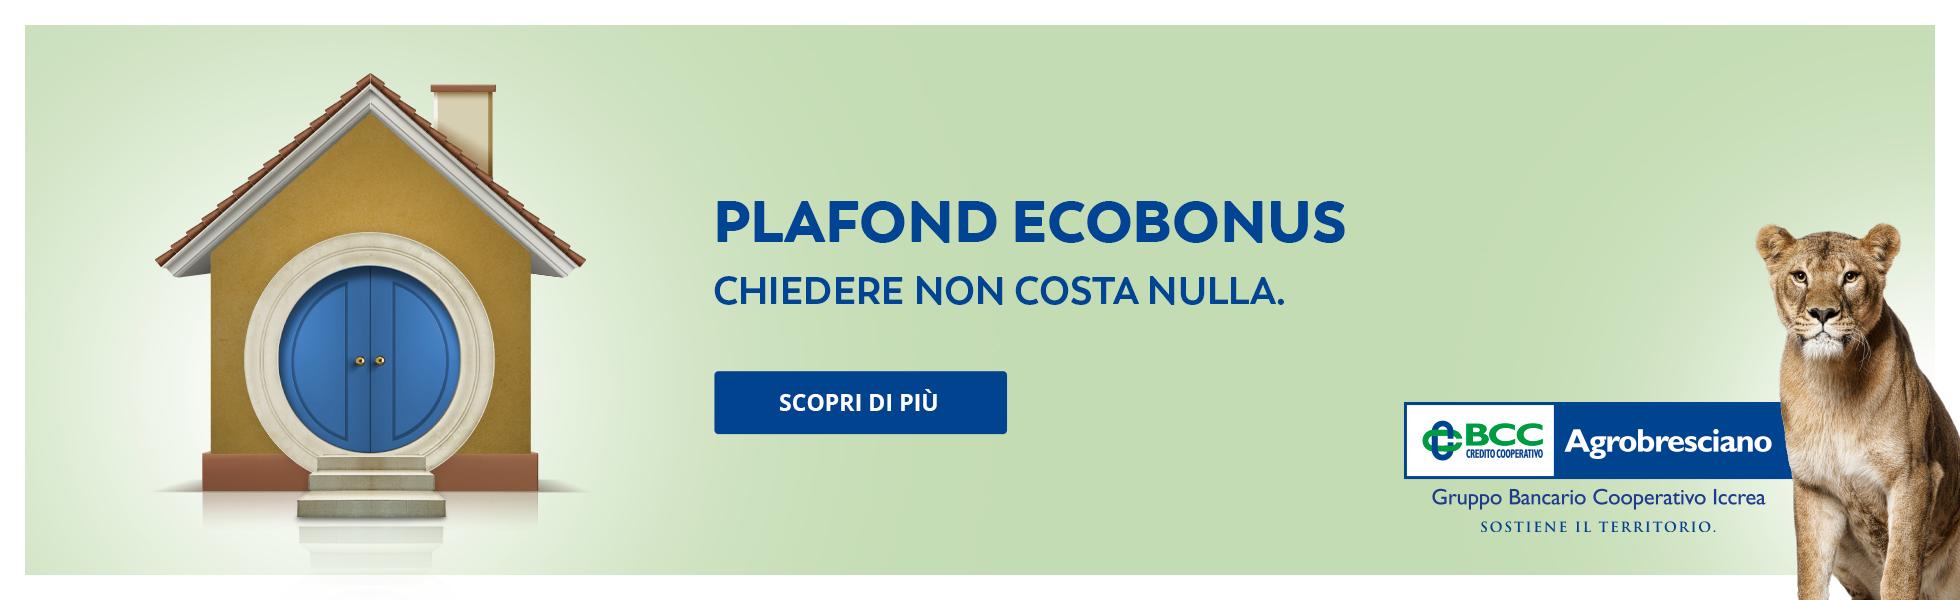 Banner Responsive Plafond Ecobonus